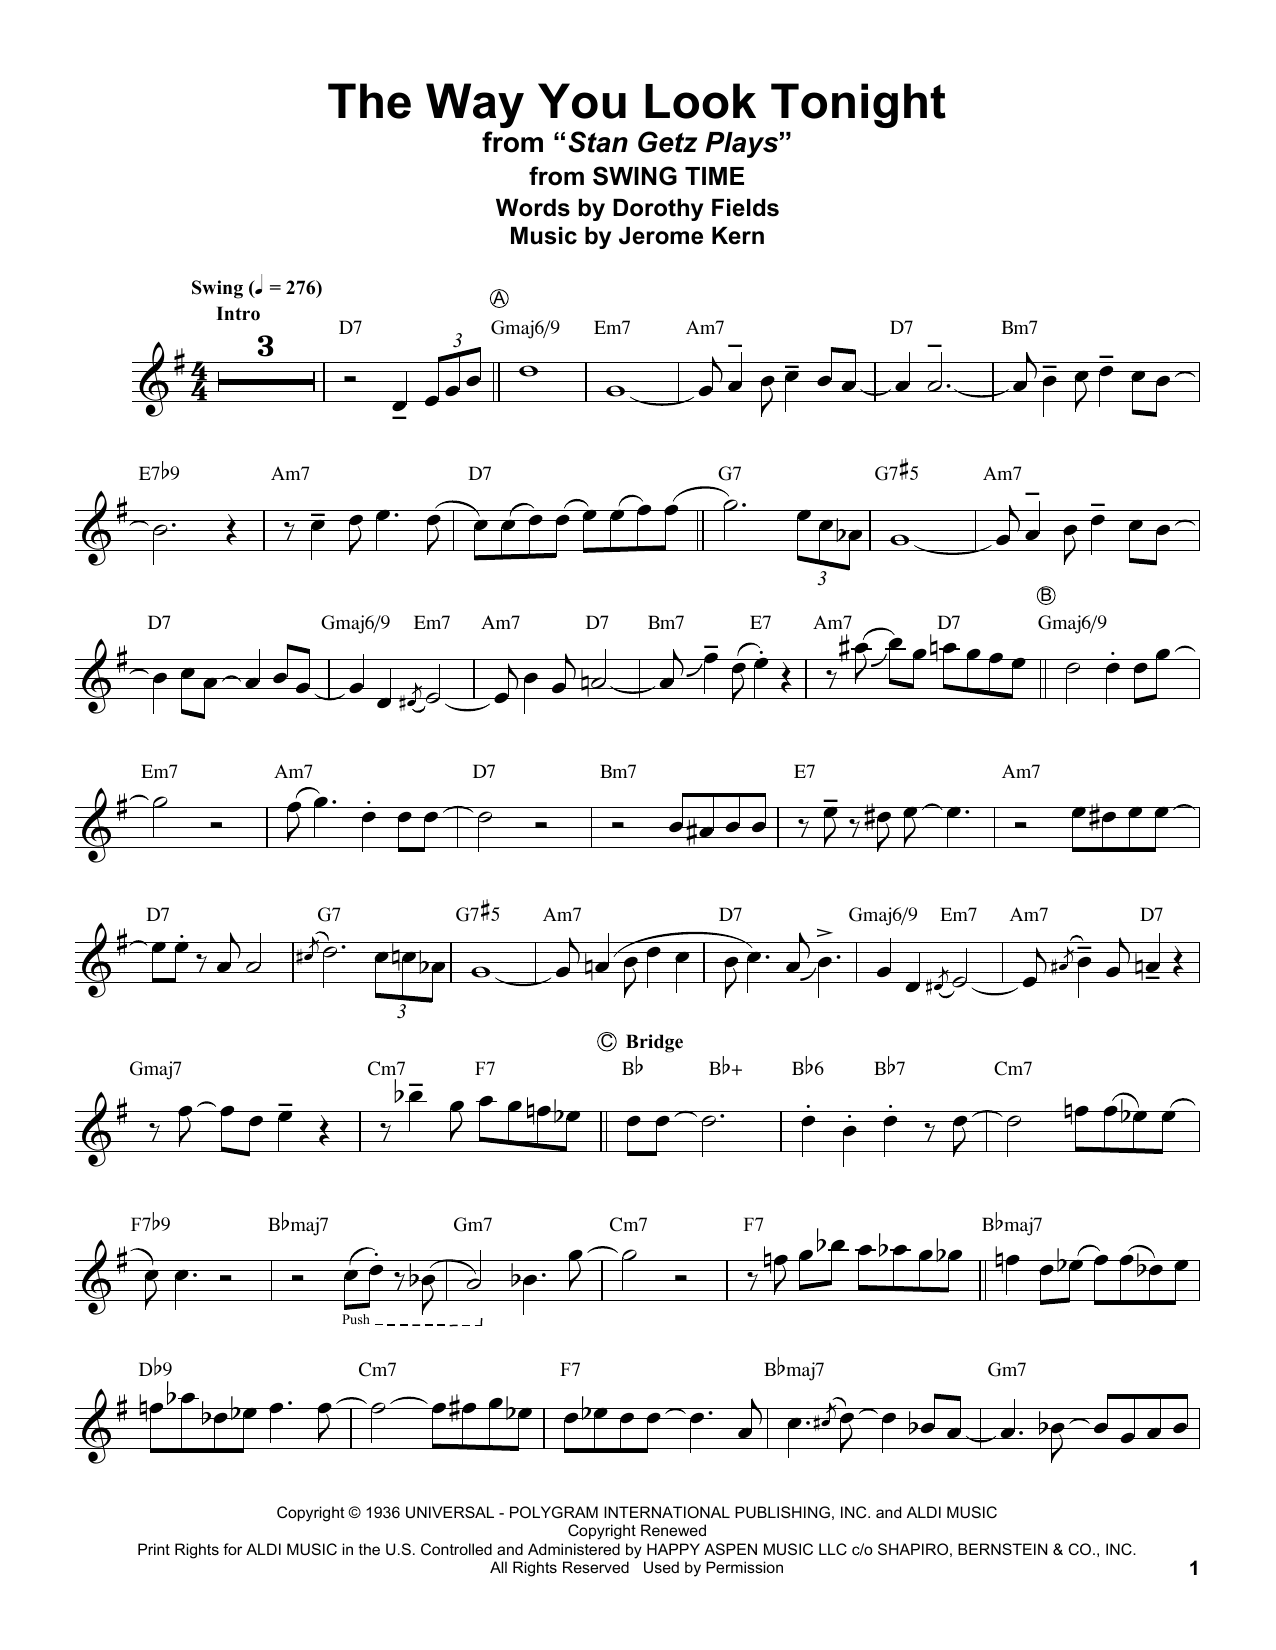 The Way You Look Tonight (Tenor Sax Transcription)